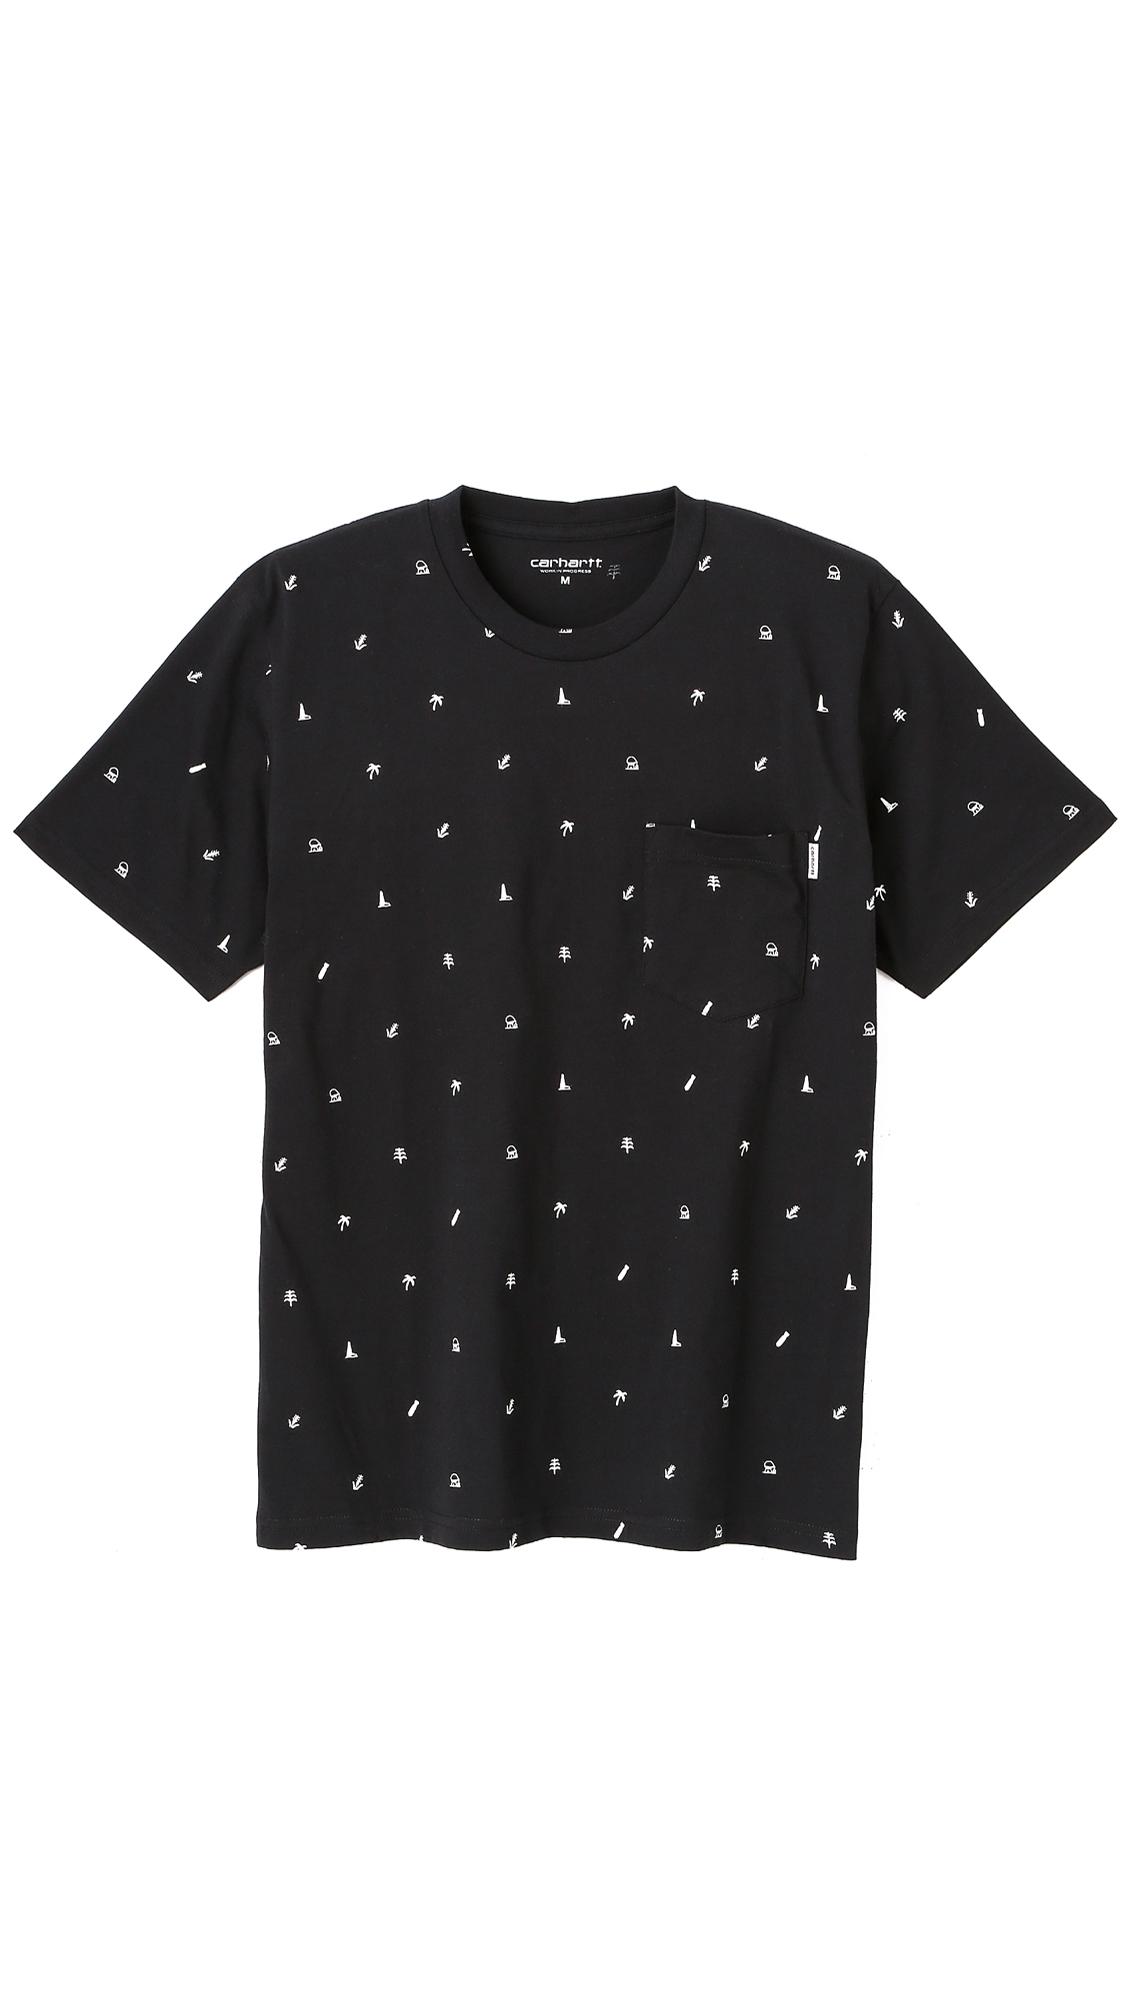 2474d2529 Carhartt WIP Economy Pocket T-Shirt in Black for Men - Lyst